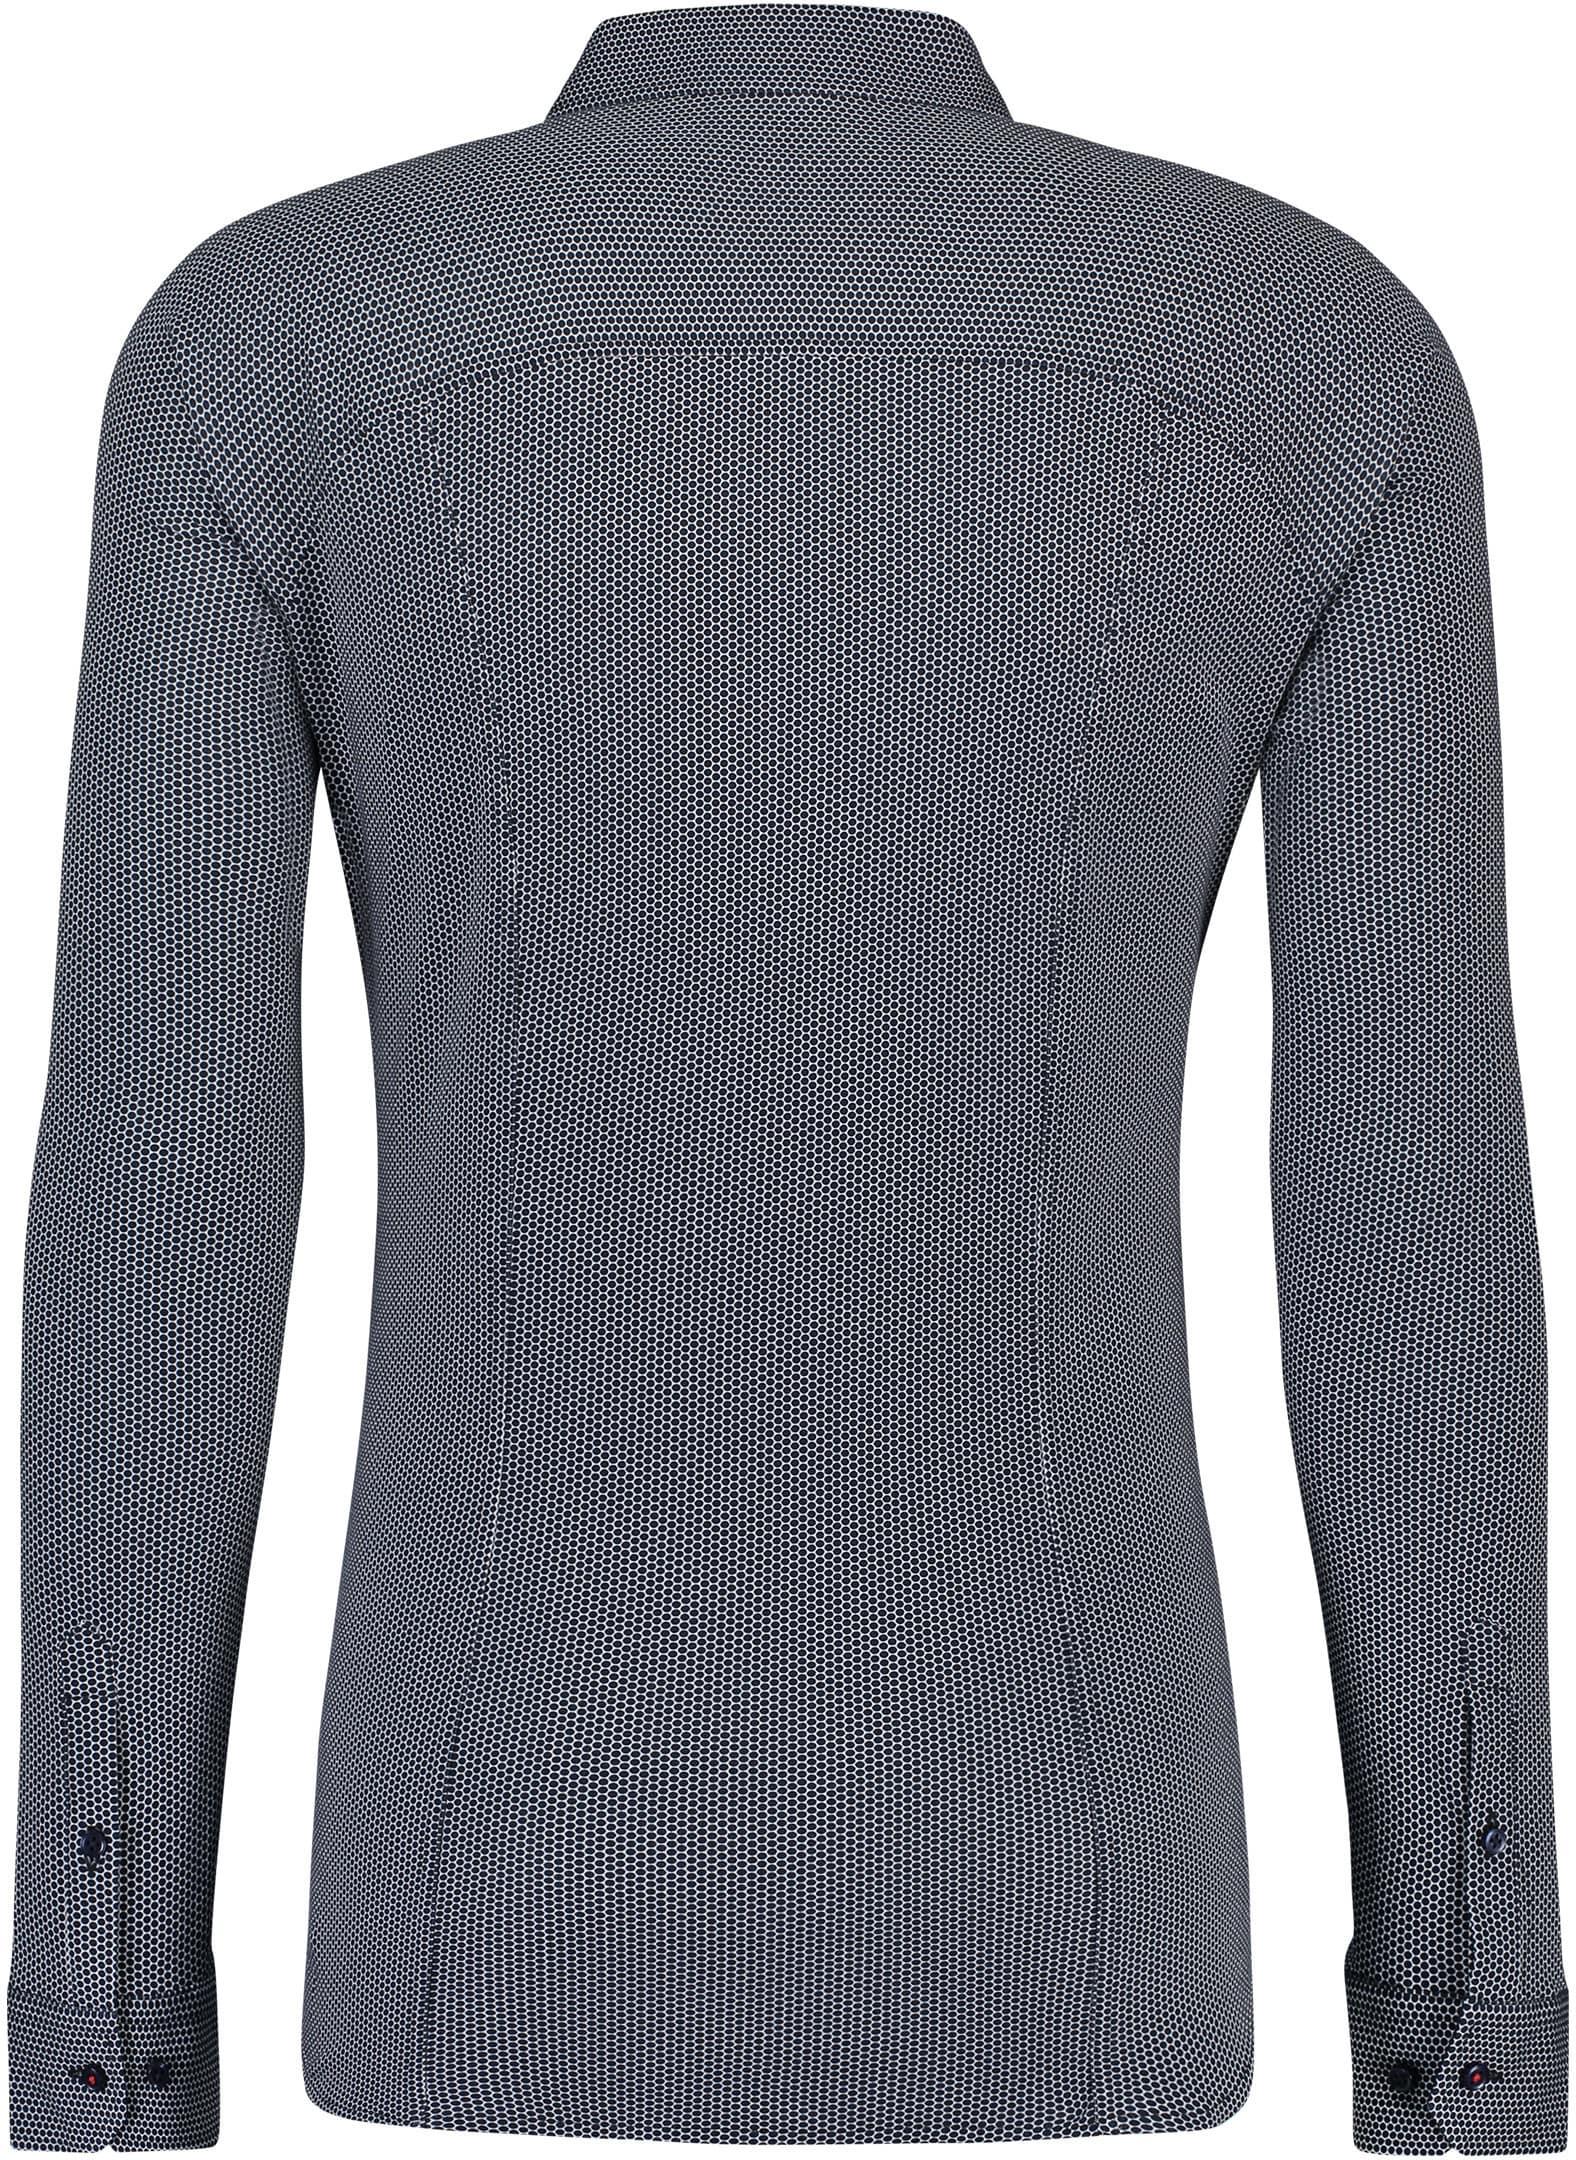 Desoto Overhemd Strijkvrij Stippen Donkerblauw foto 1